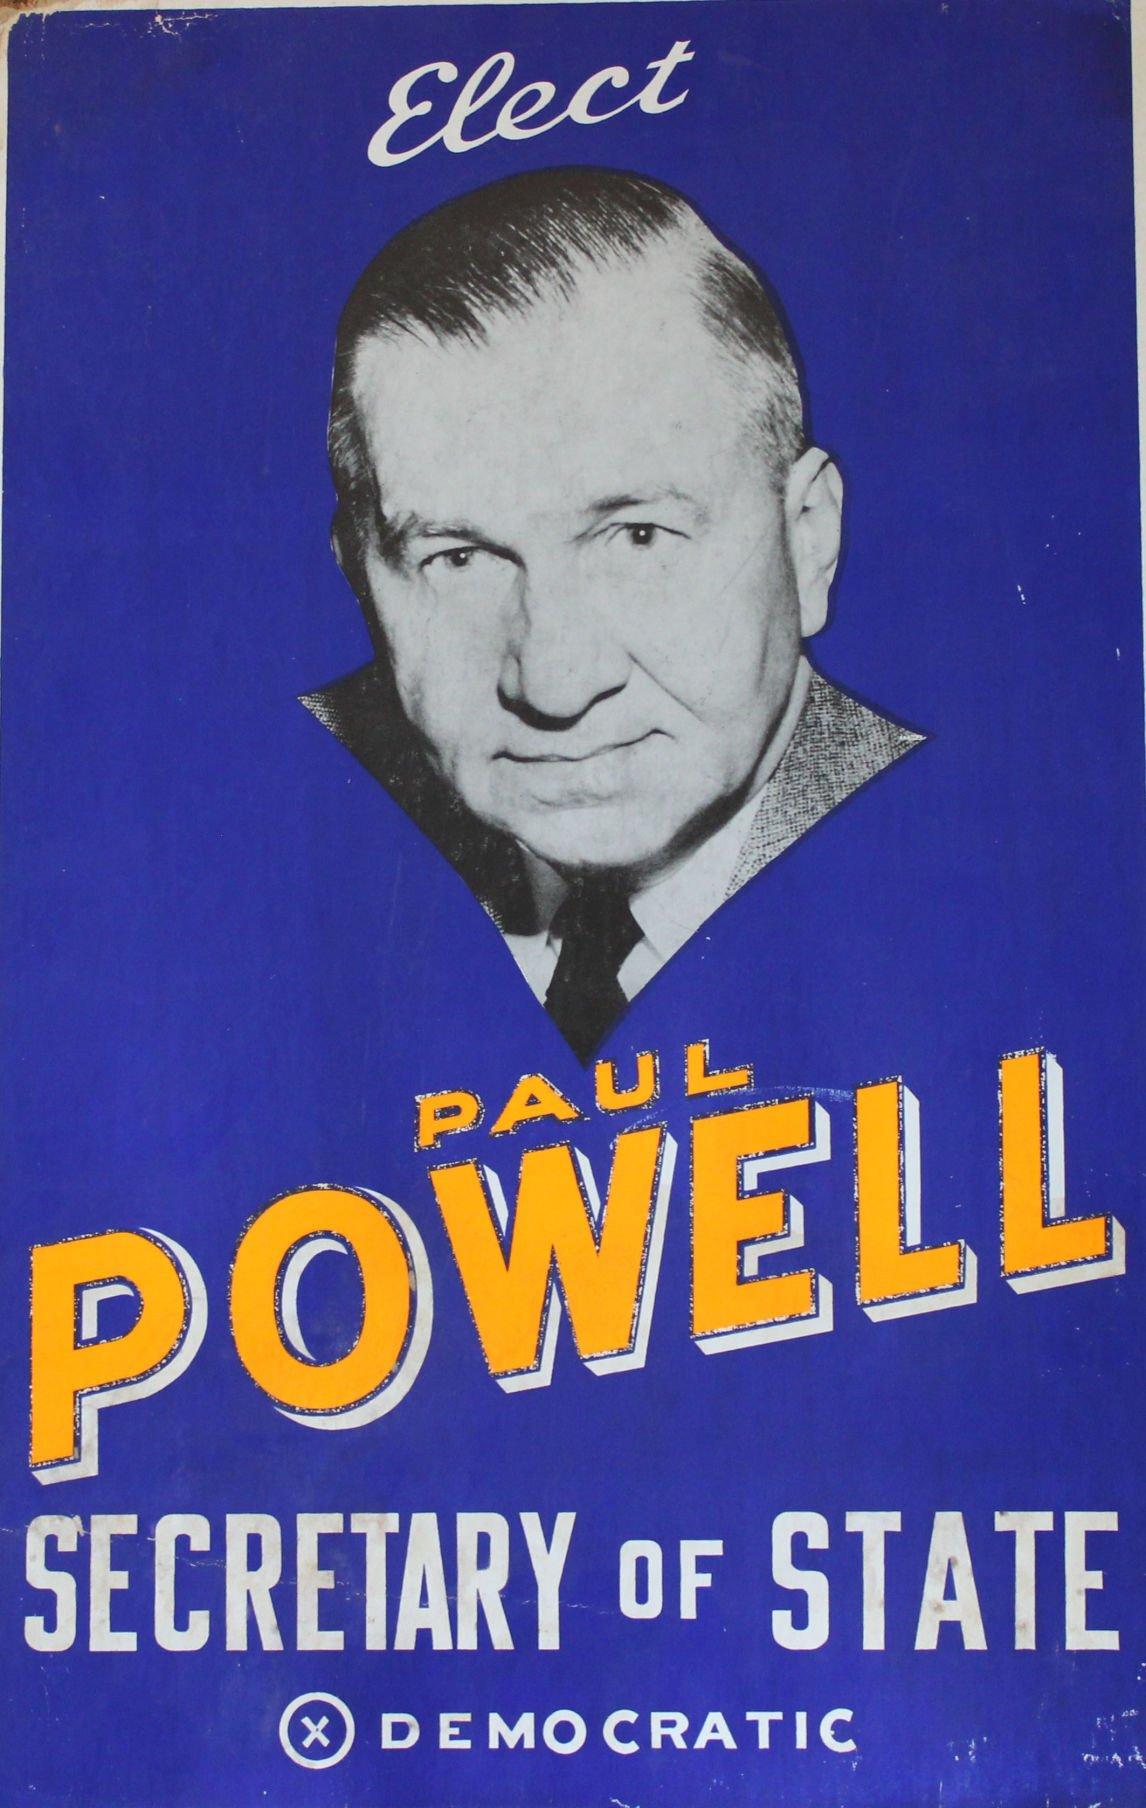 Paul Powell Poster ed.jpg